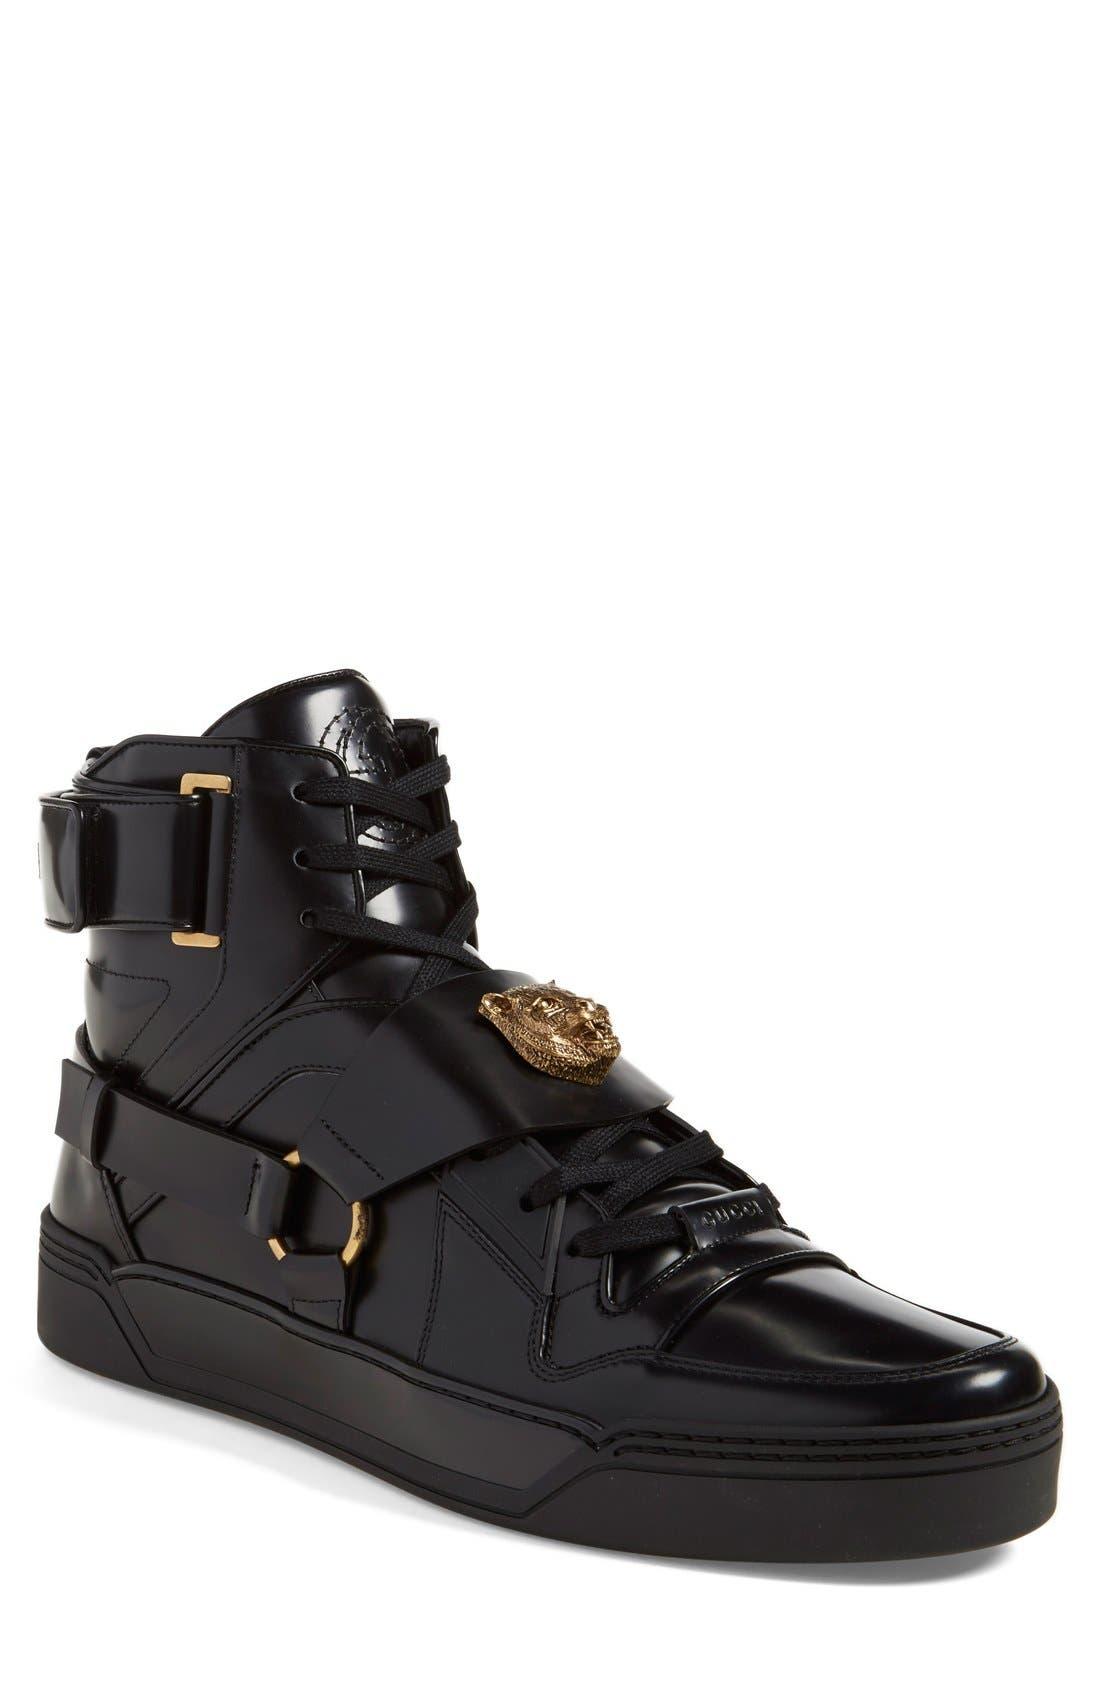 Alternate Image 1 Selected - Gucci 'Tiger' High Top Sneaker (Men)